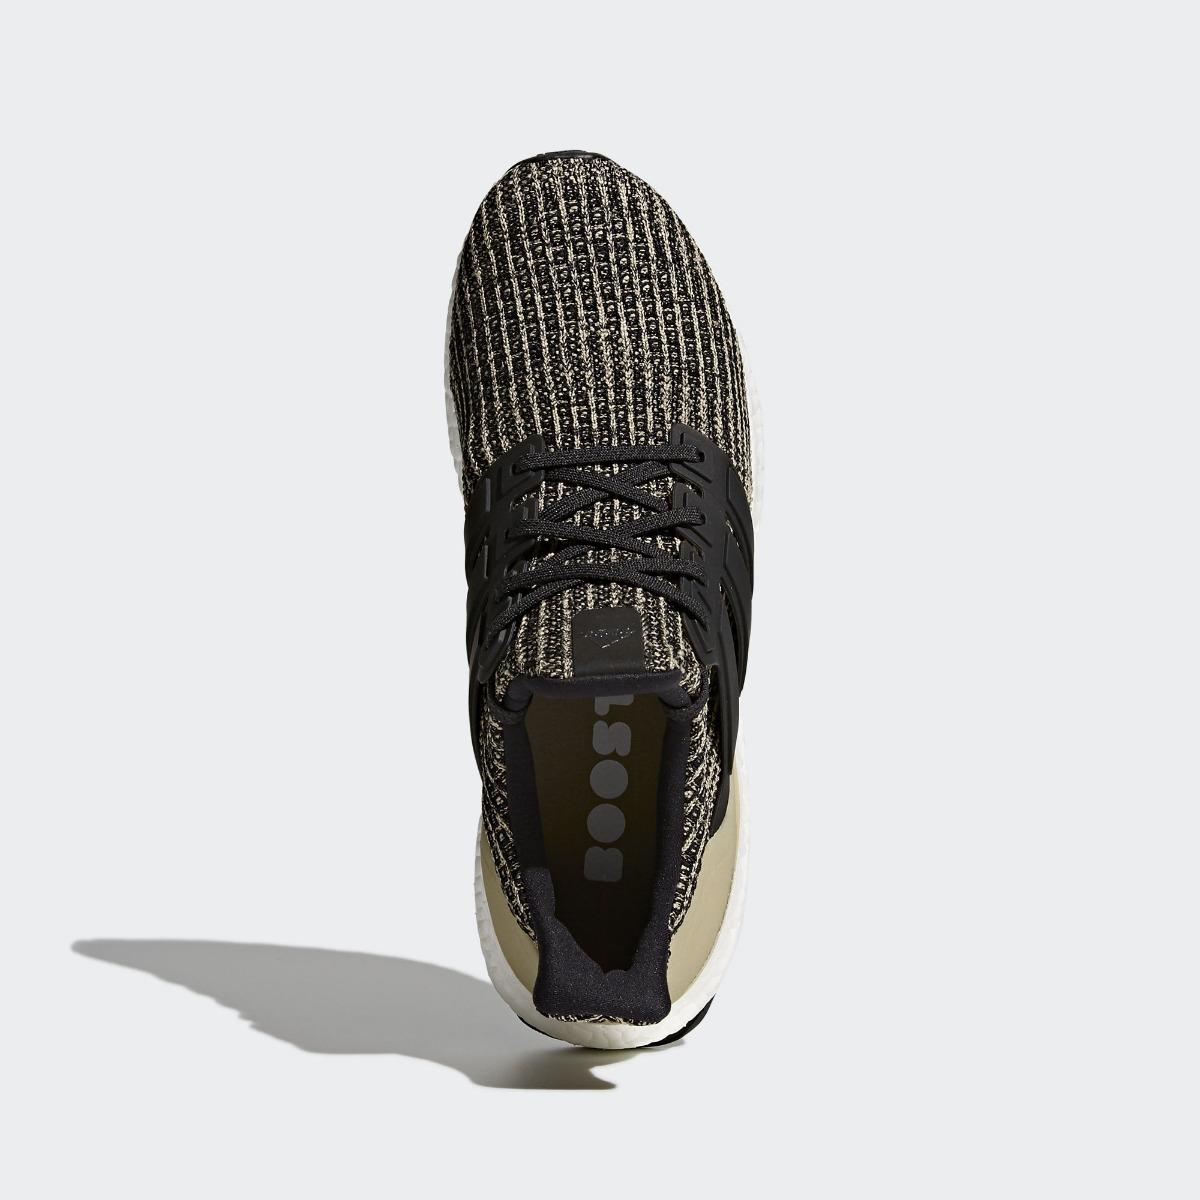 Zapatillas adidas Ultraboost Hombre Neggold